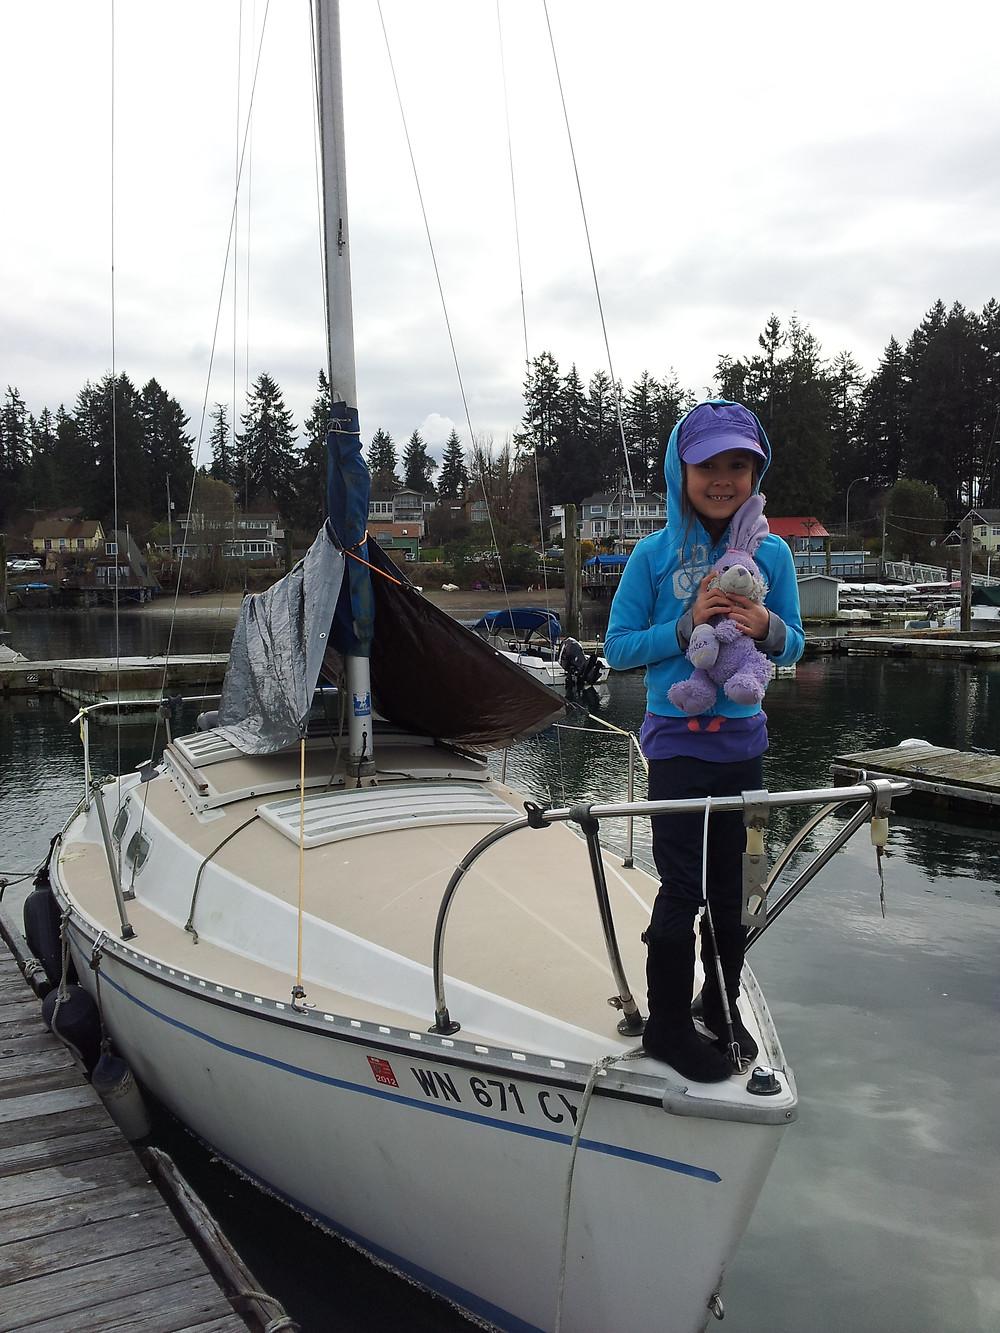 Zana Kanyaa on our 1977 Chrysler 22 sailboat